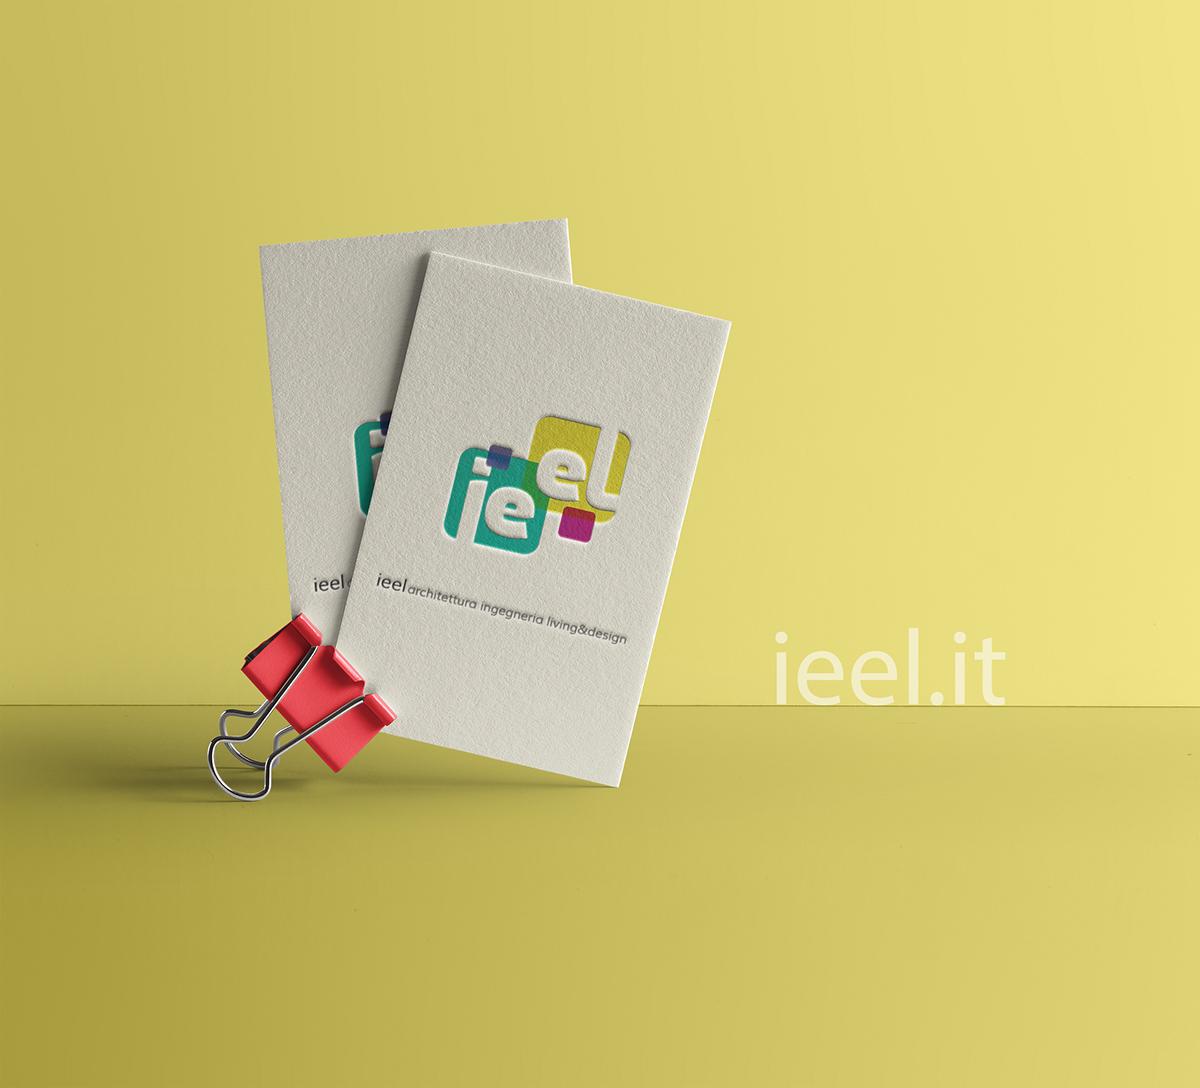 logo Web immagine coordinata branding